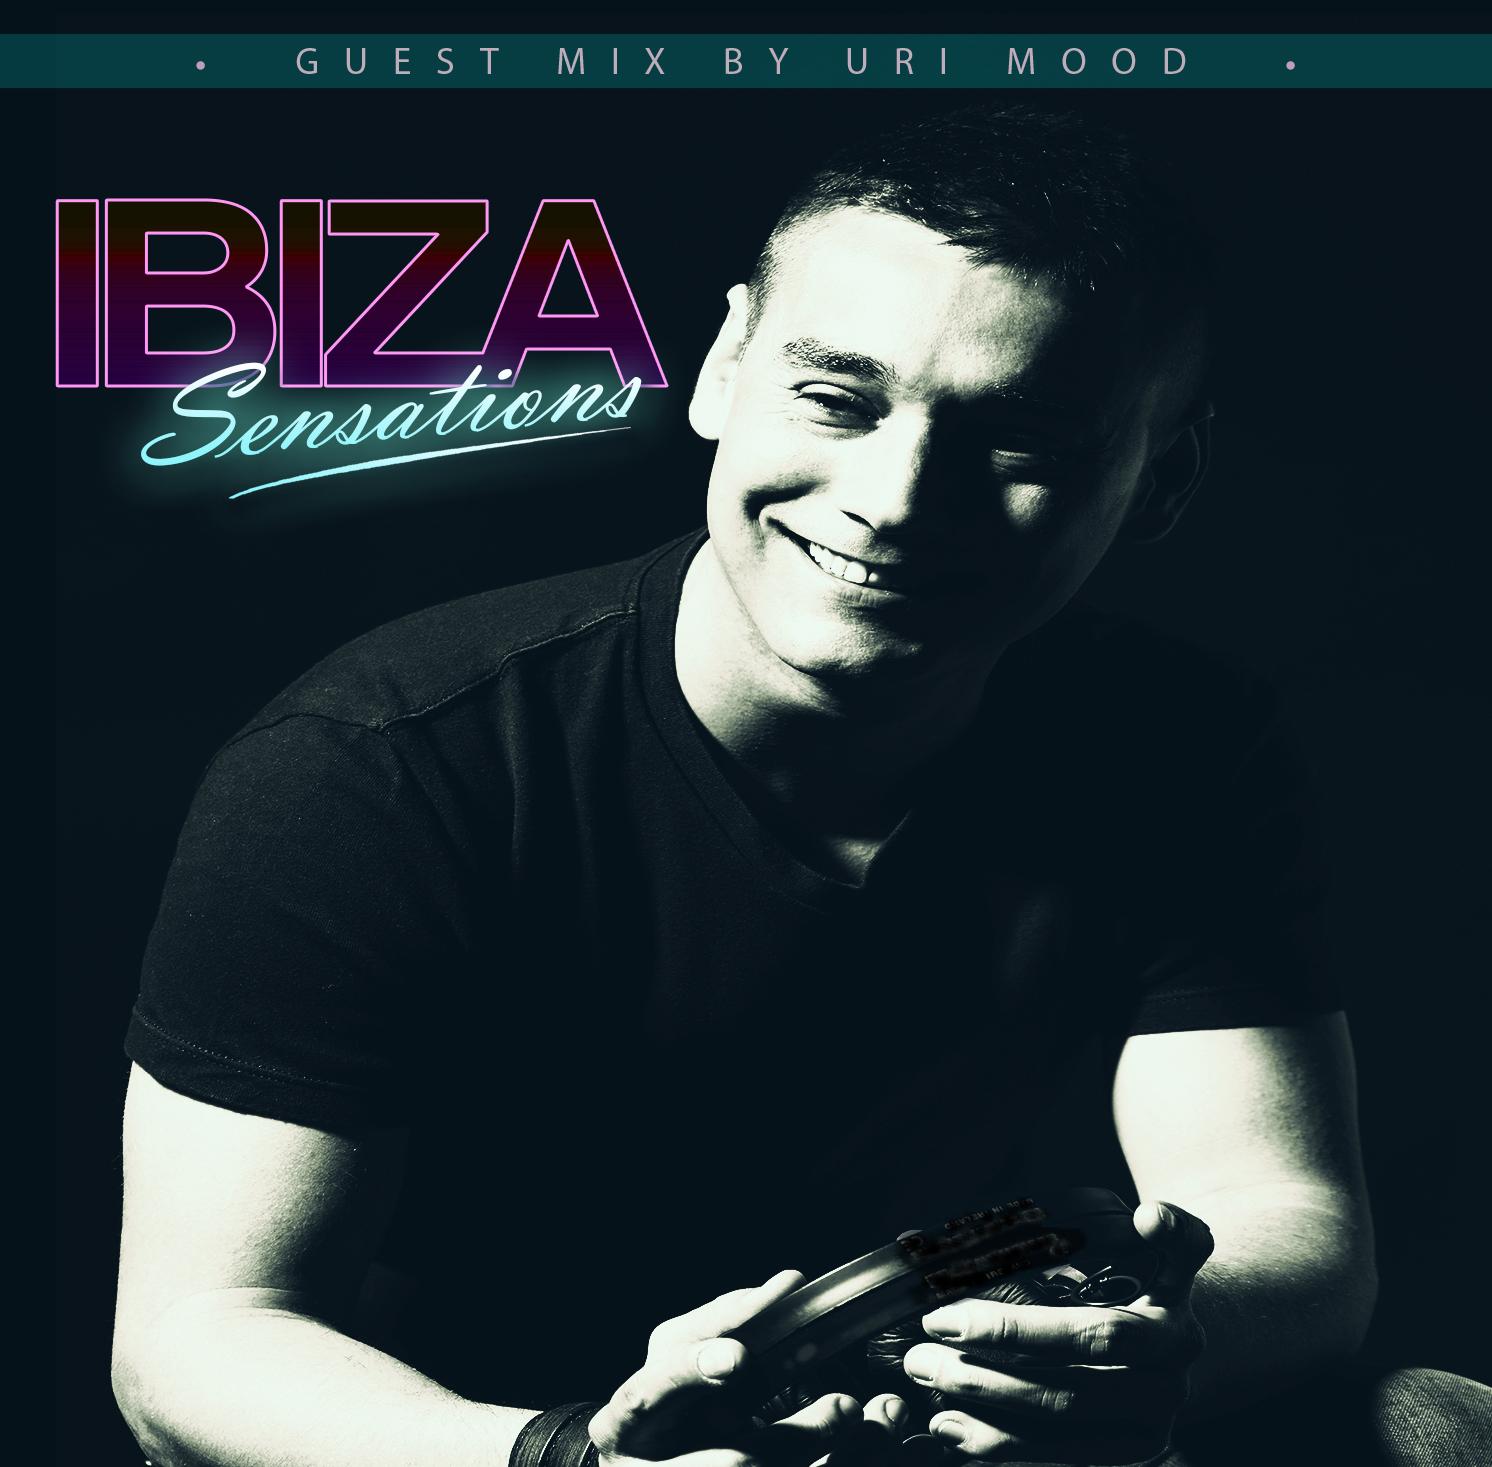 Ibiza Sensations 125 Guest Mix by Uri Mood